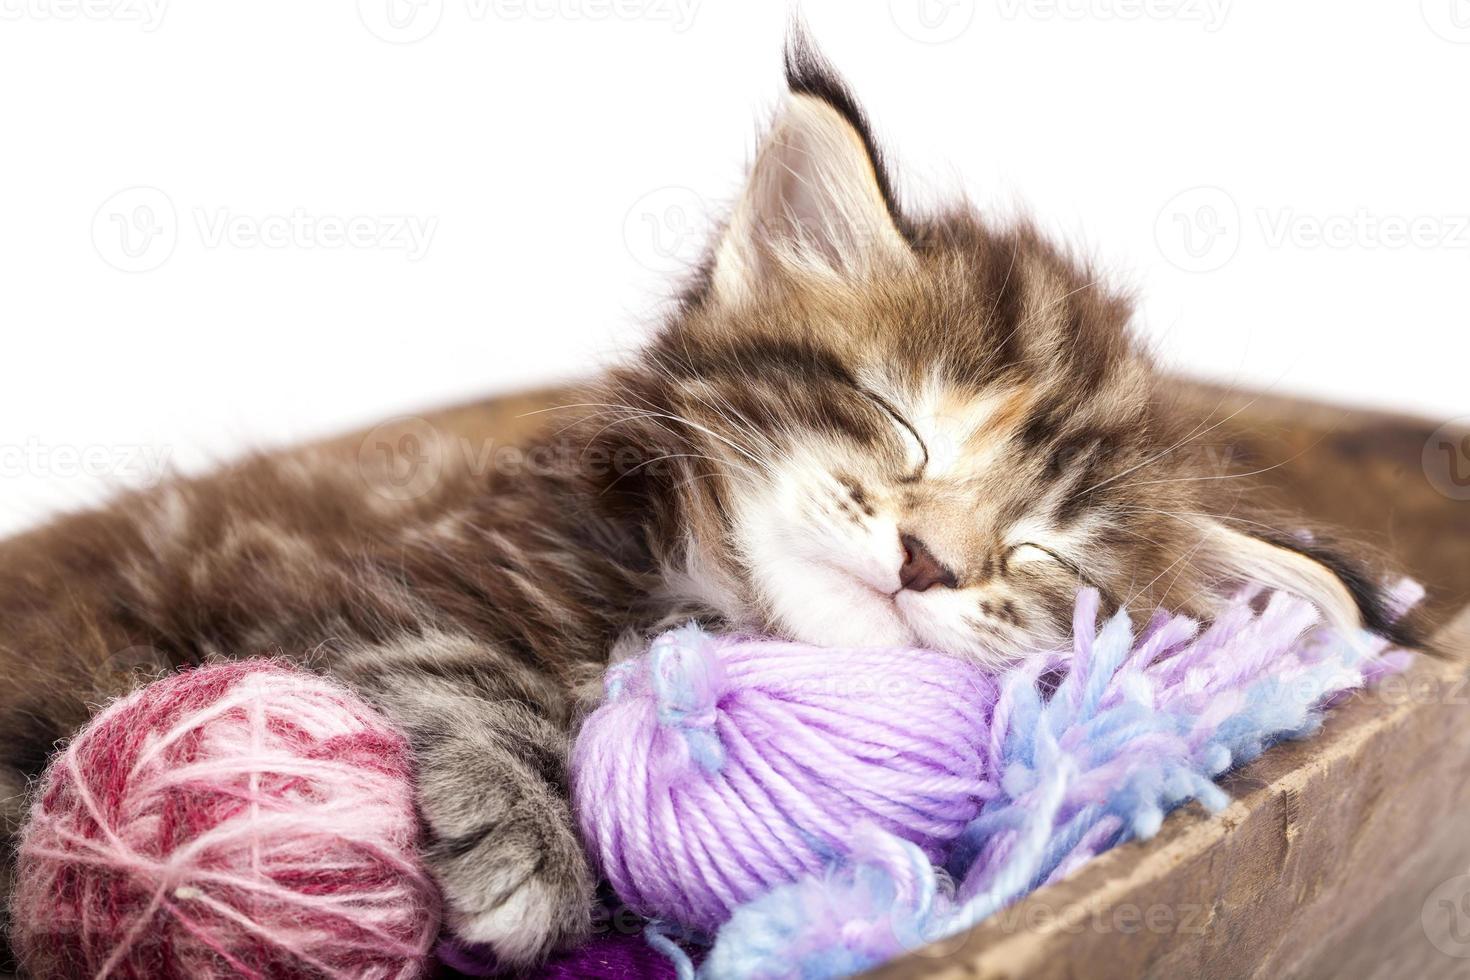 gatito dormido foto